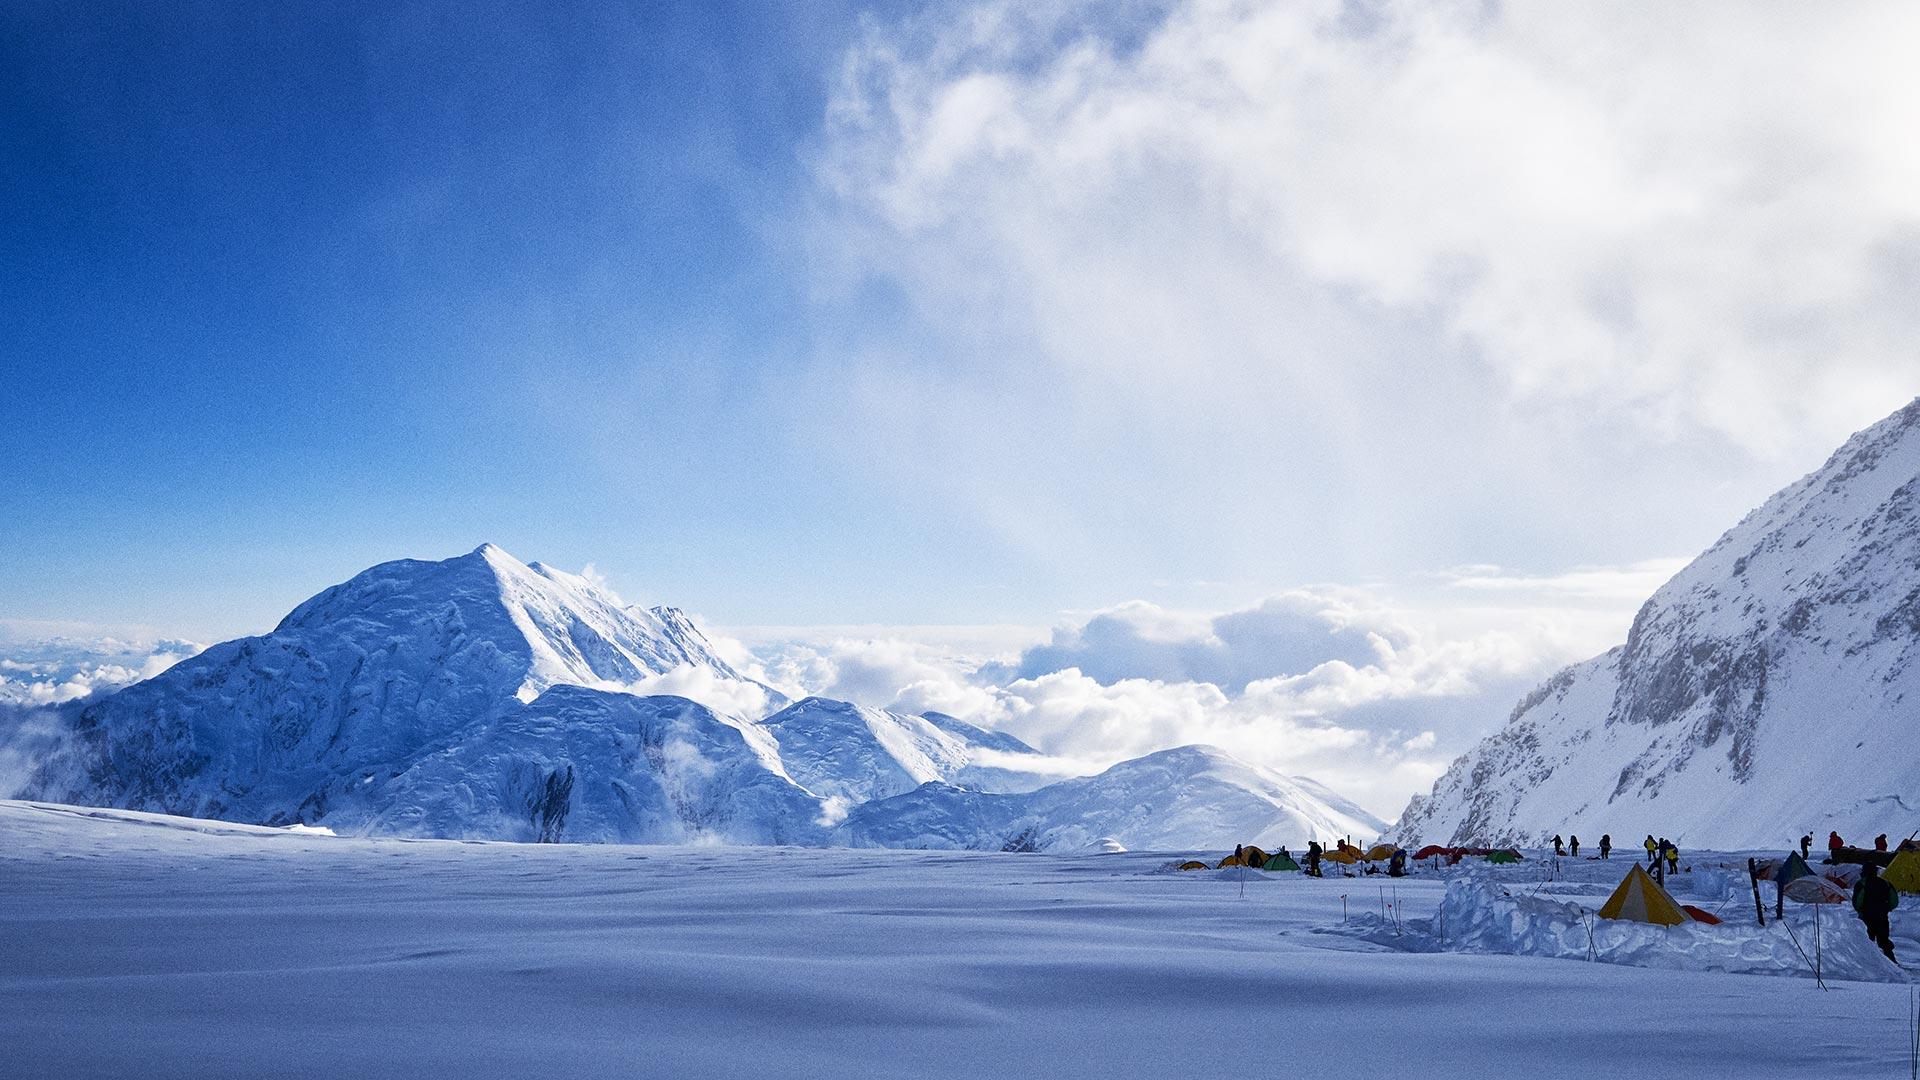 PDJPhoto, Peter de Jong, sluisweg 59, 2225 xj, Katwijk, 2017, Denali, Alaska, expeditie, cold, warm, team, 7, seven, seven summits